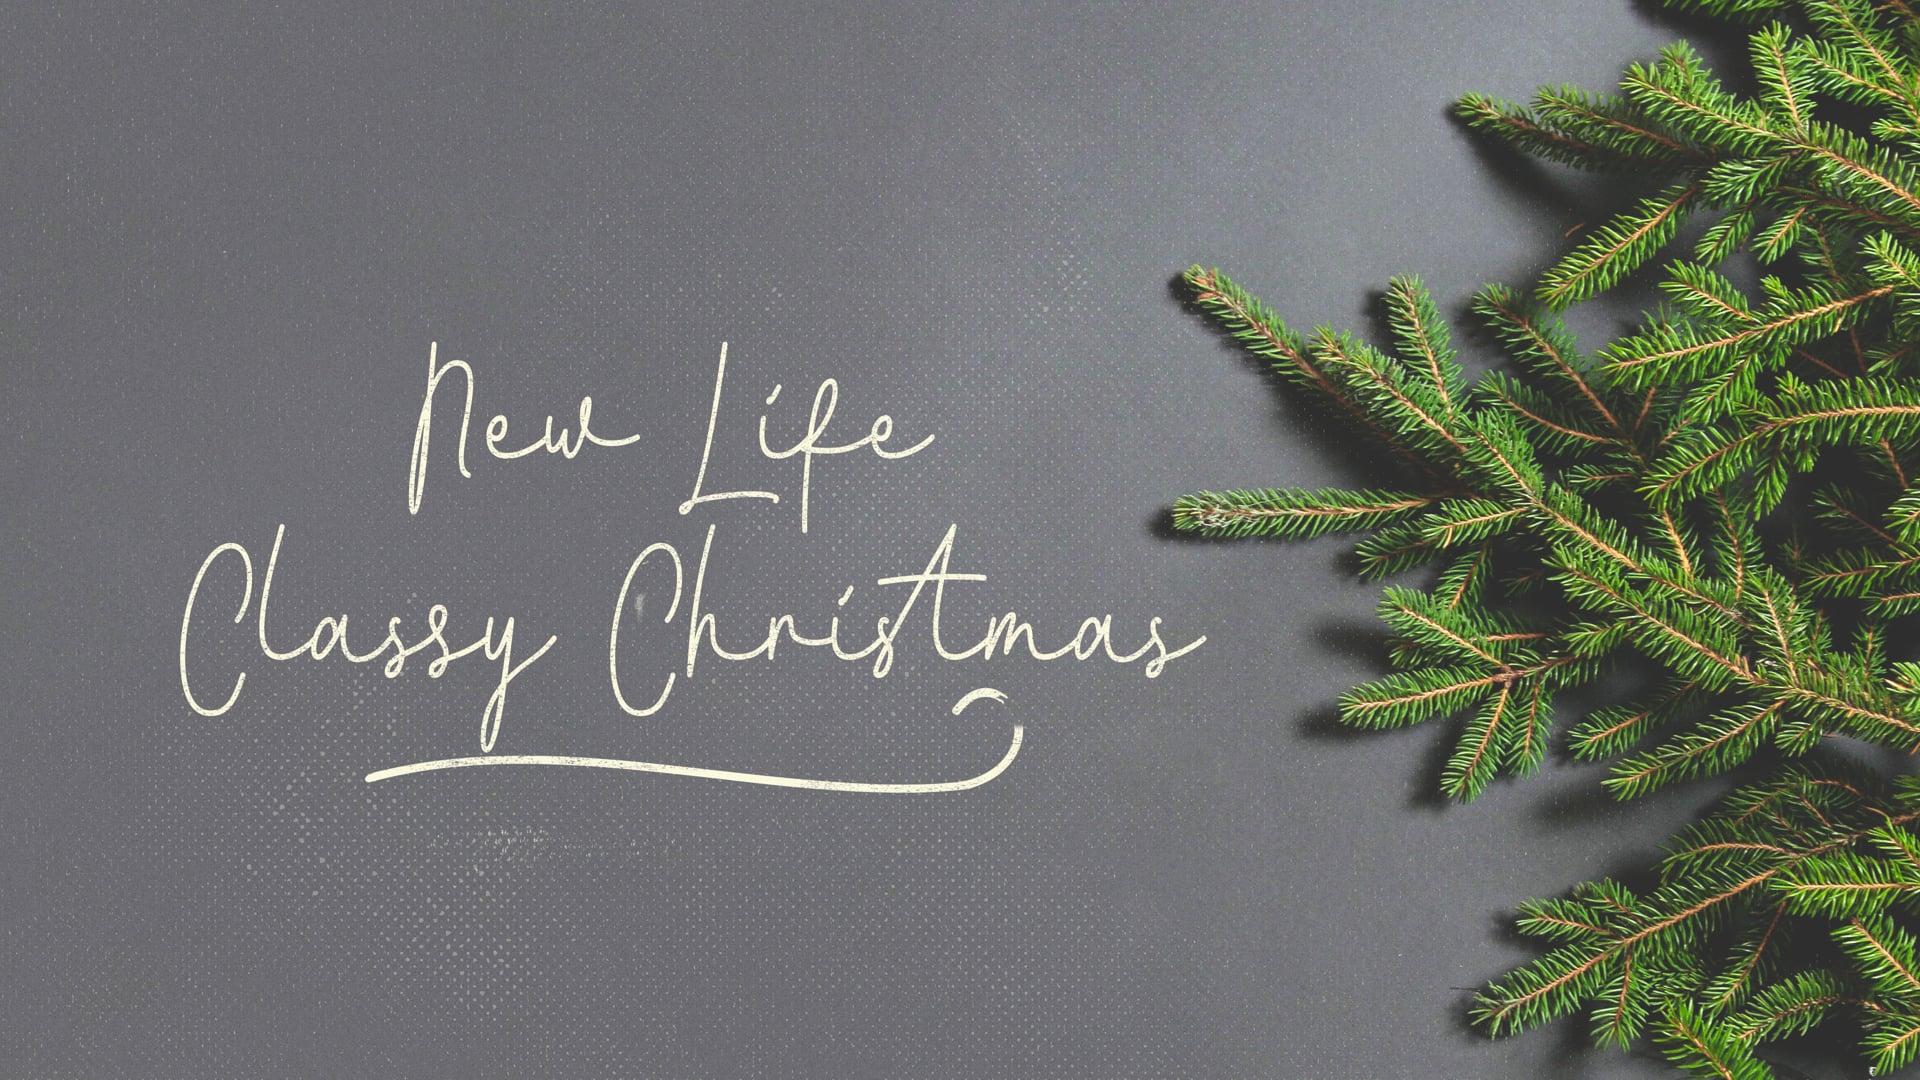 Dec 16, 2018 - New Life Classy Christmas